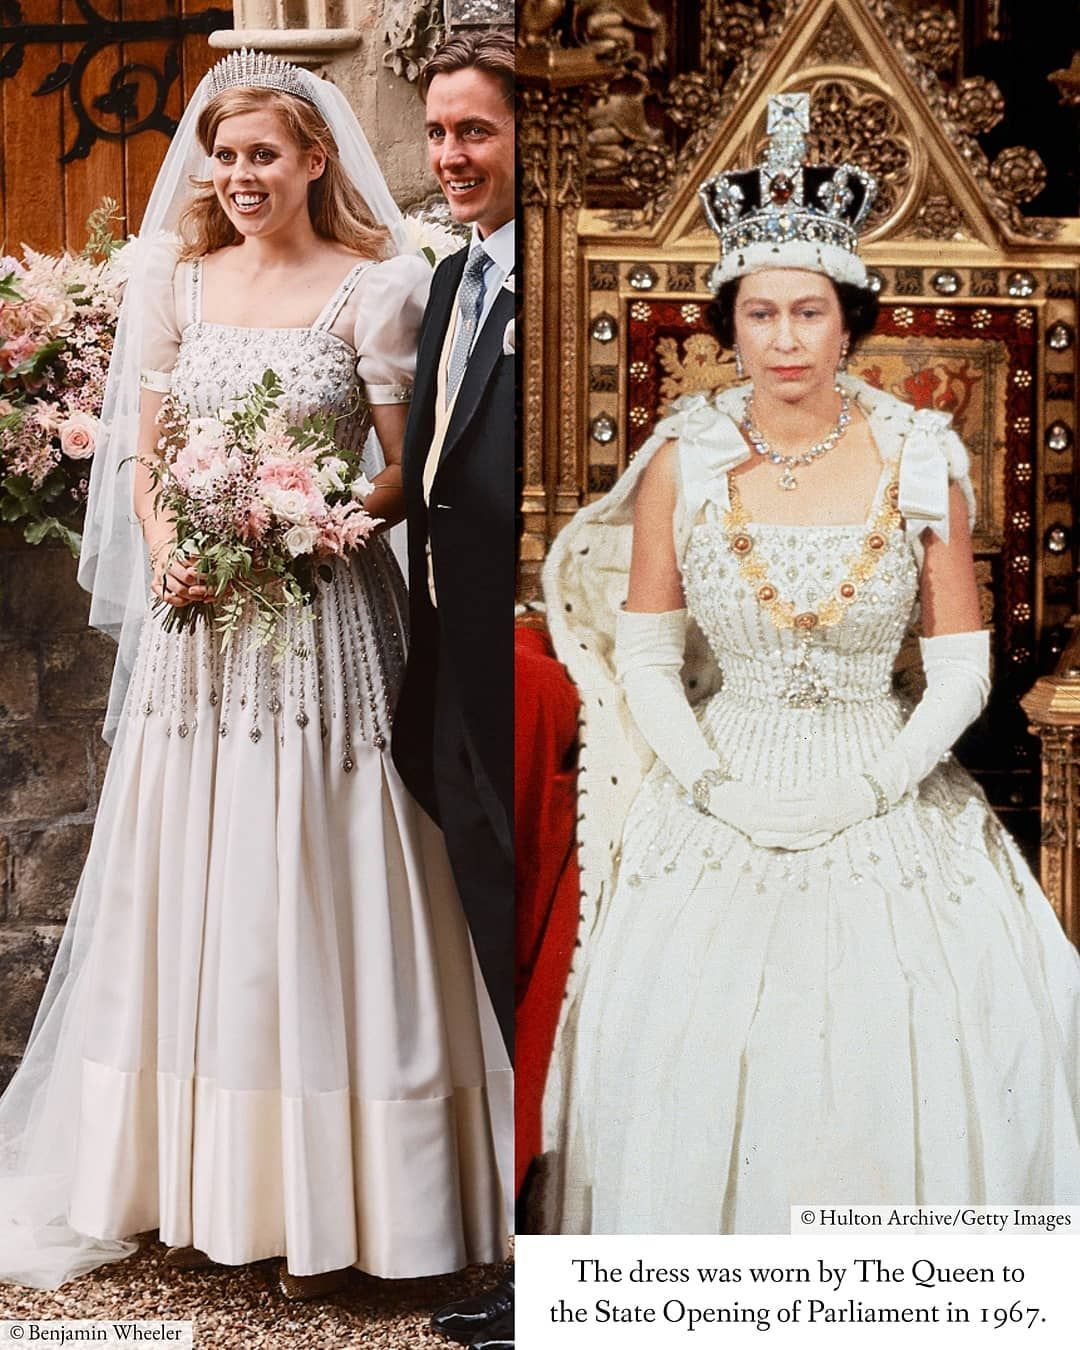 Queen Elizabeth Ii Fan Page On Instagram More Information On Princess Beatrice S Wedding Royal Wedding Gowns Royal Wedding Dress Princess Beatrice Wedding [ 1350 x 1080 Pixel ]